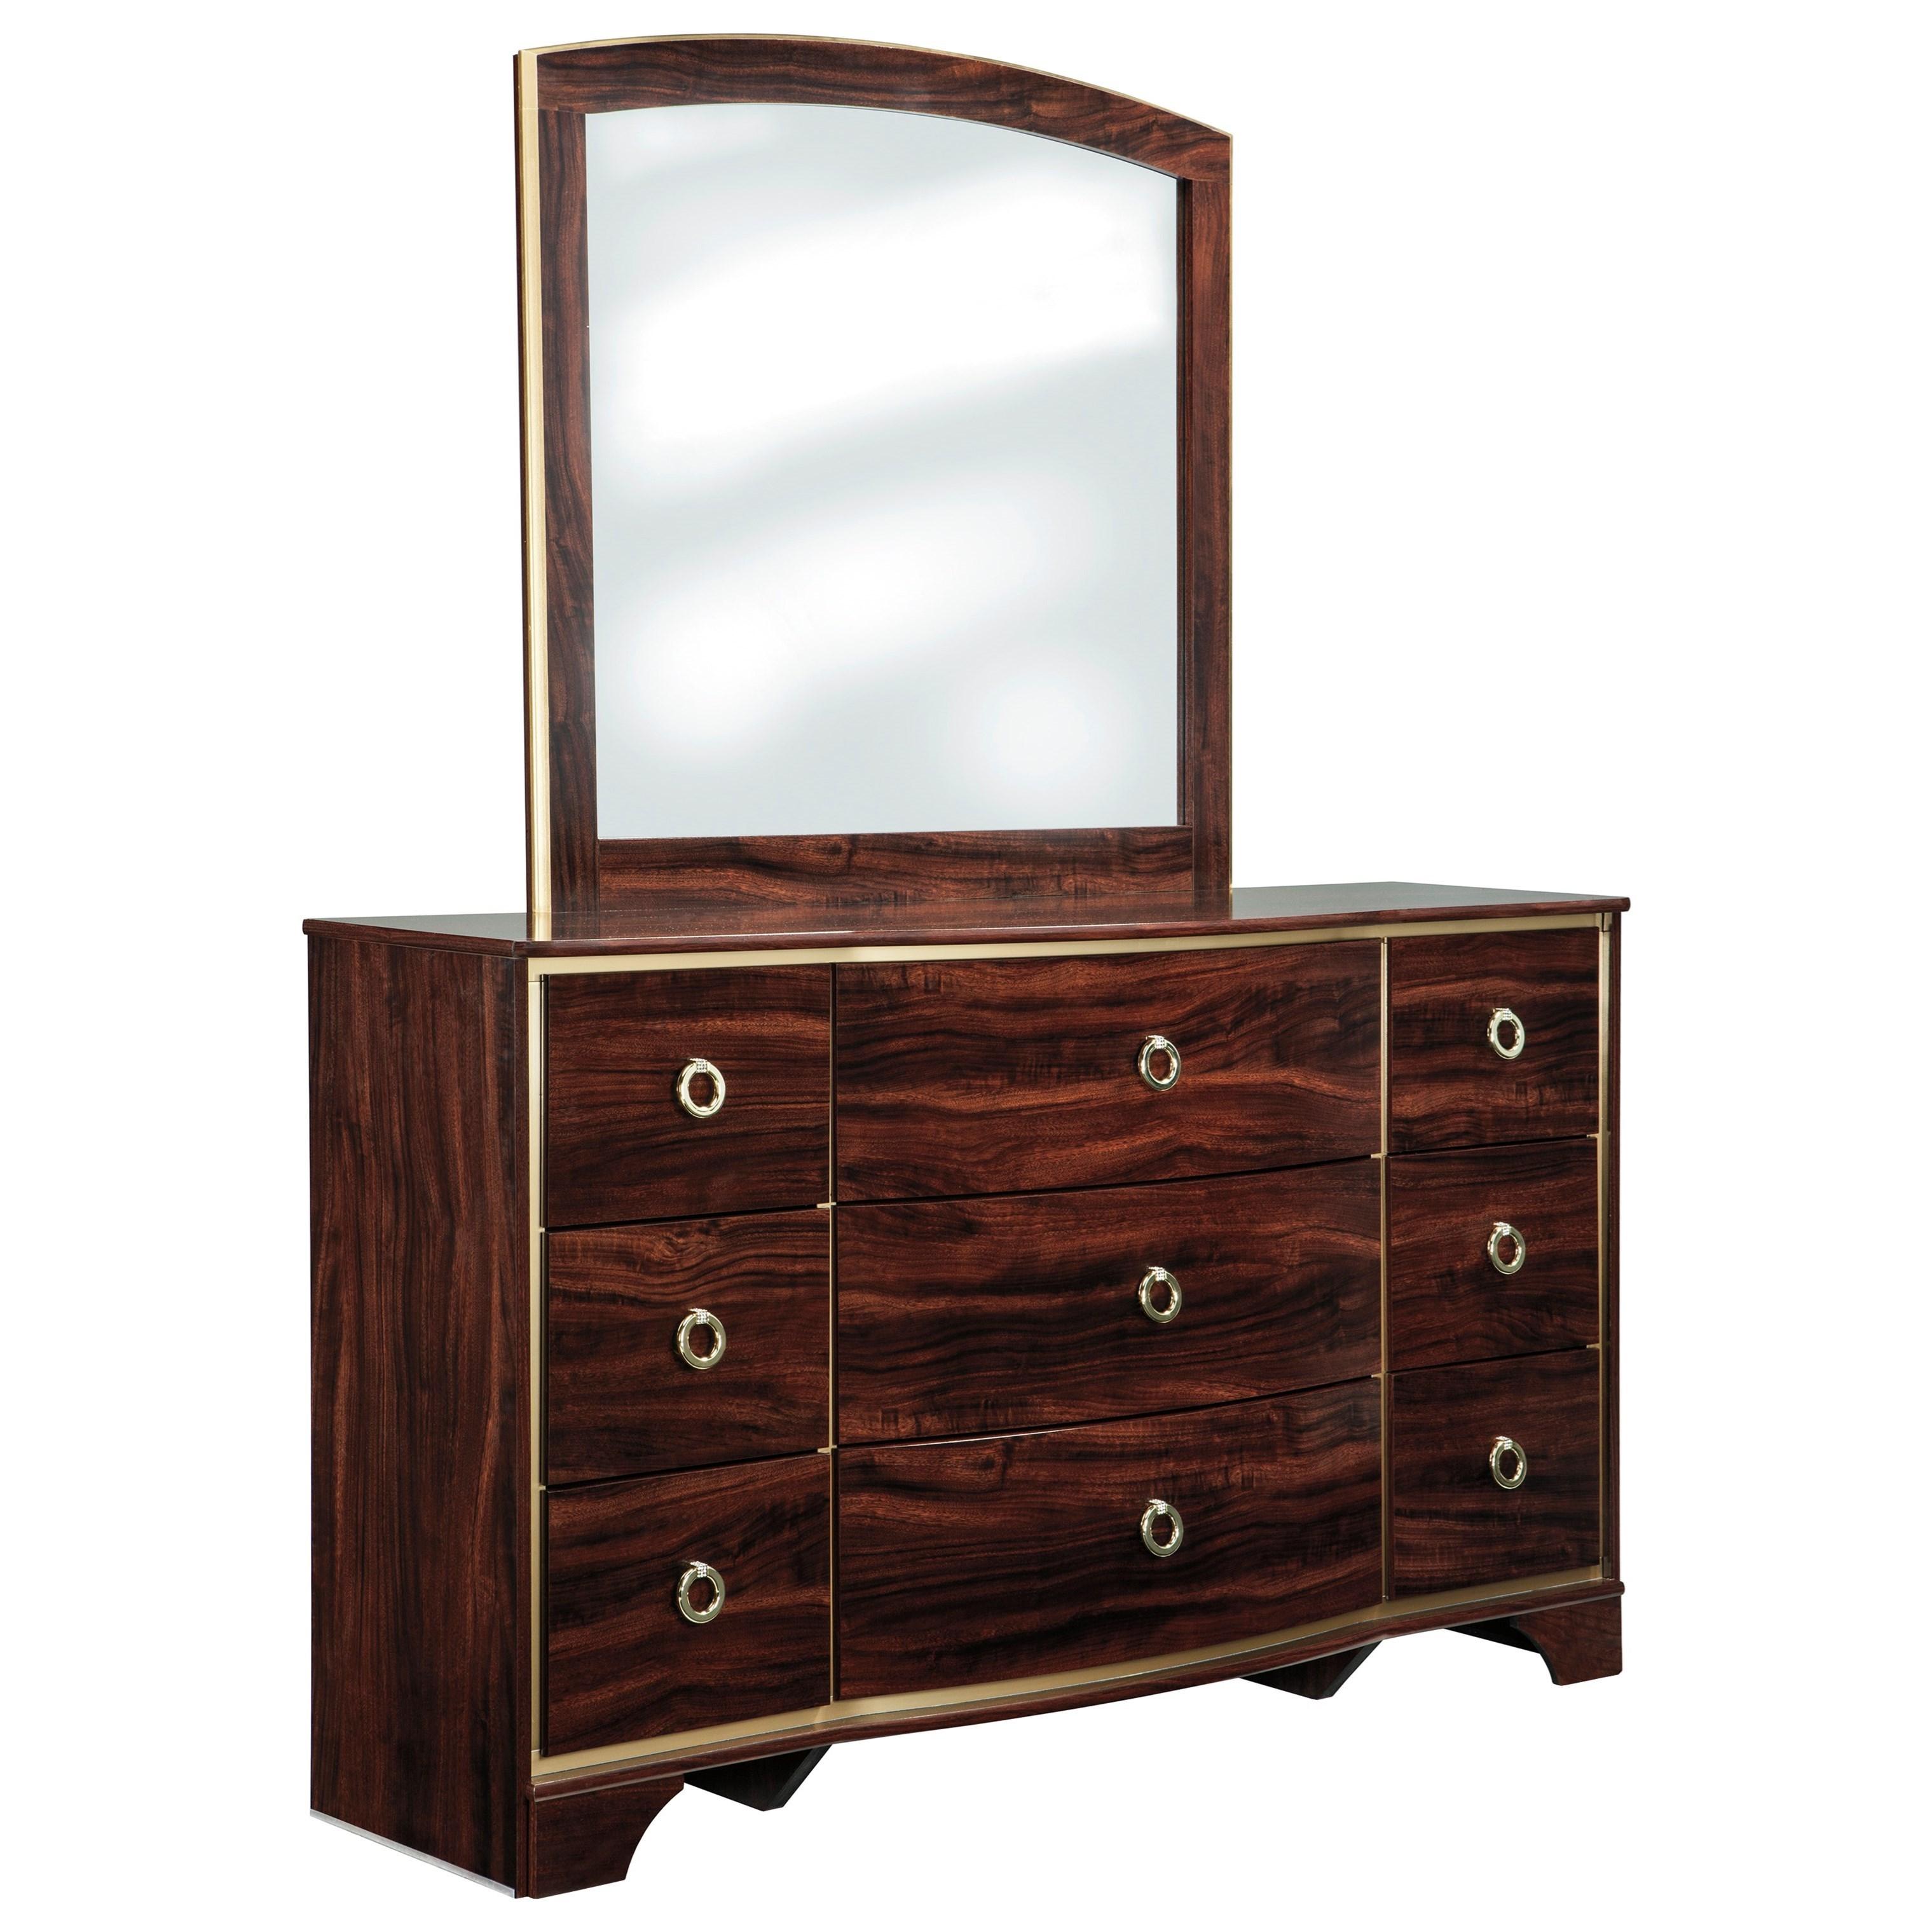 Signature Design by Ashley Lenmara Bedroom Mirror Olinde